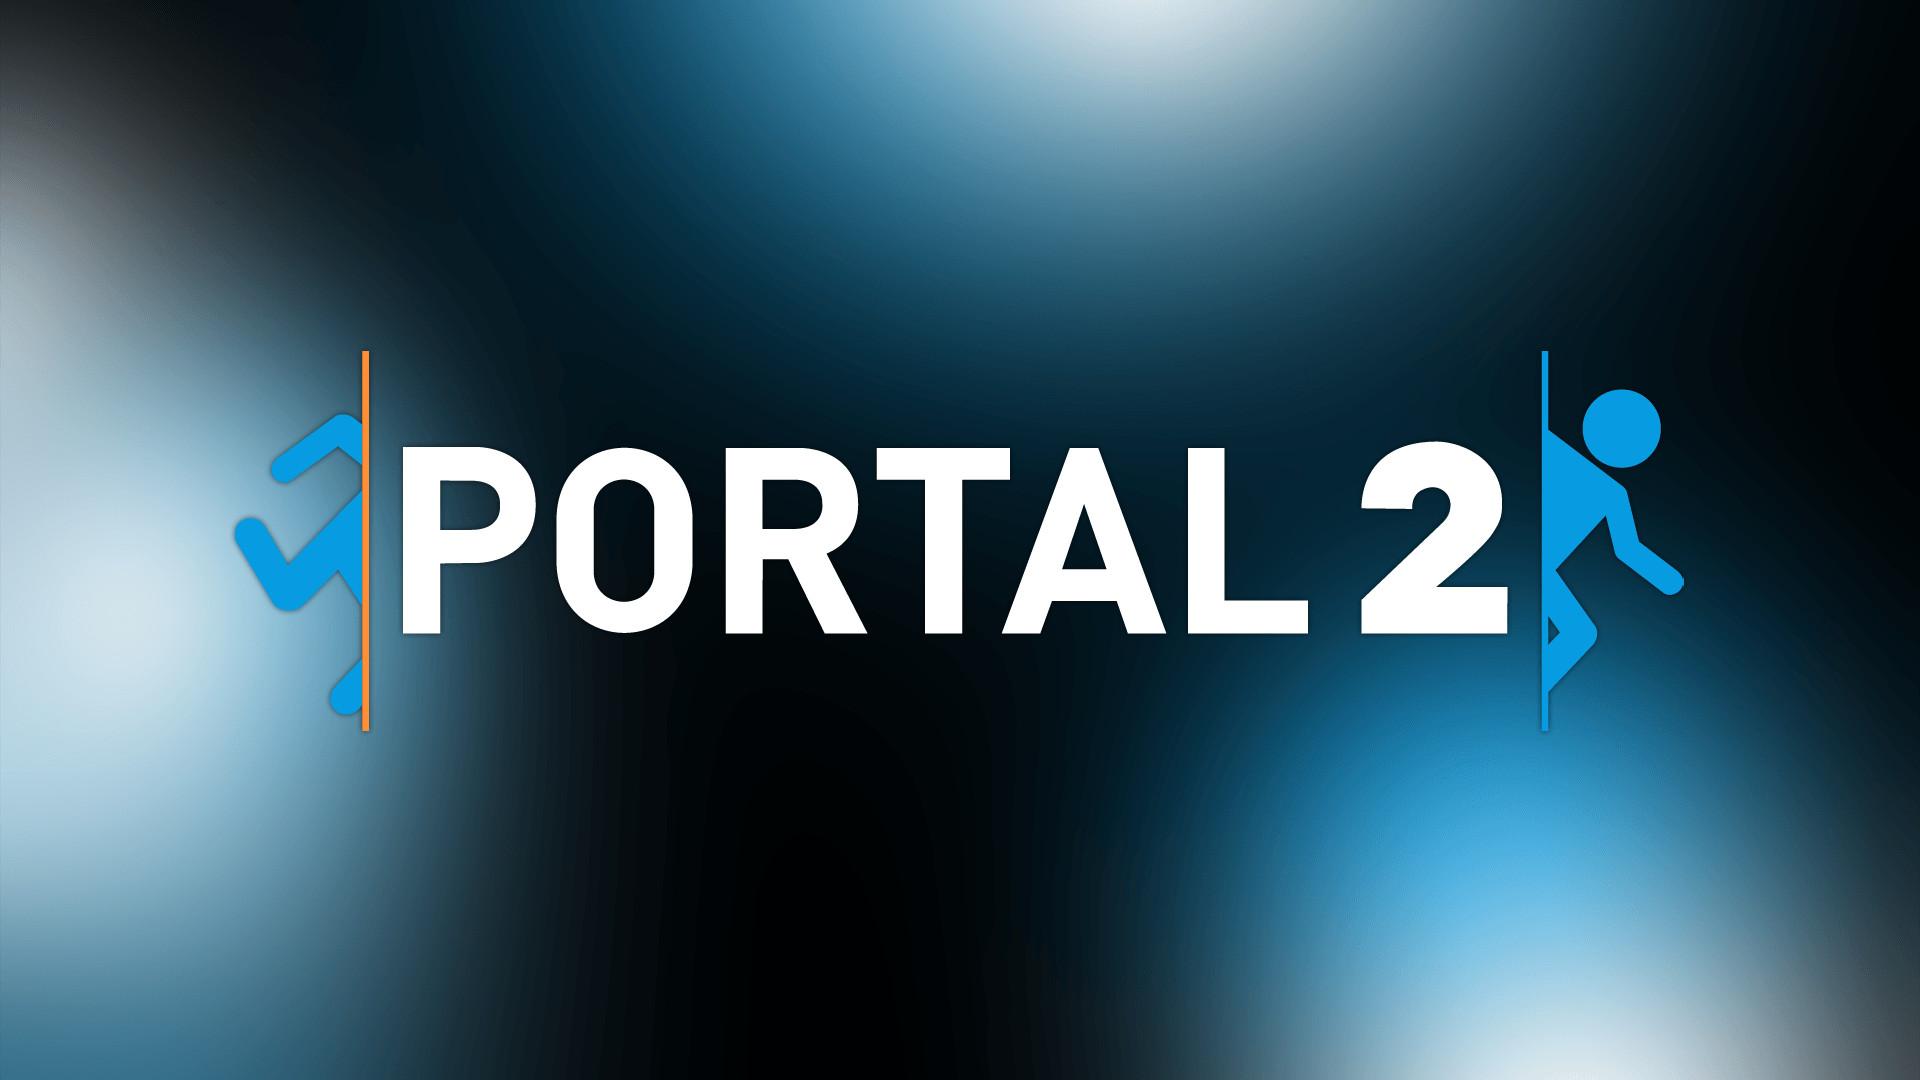 Portal 2 HD Wallpaper » FullHDWpp – Full HD Wallpapers 1920×1080